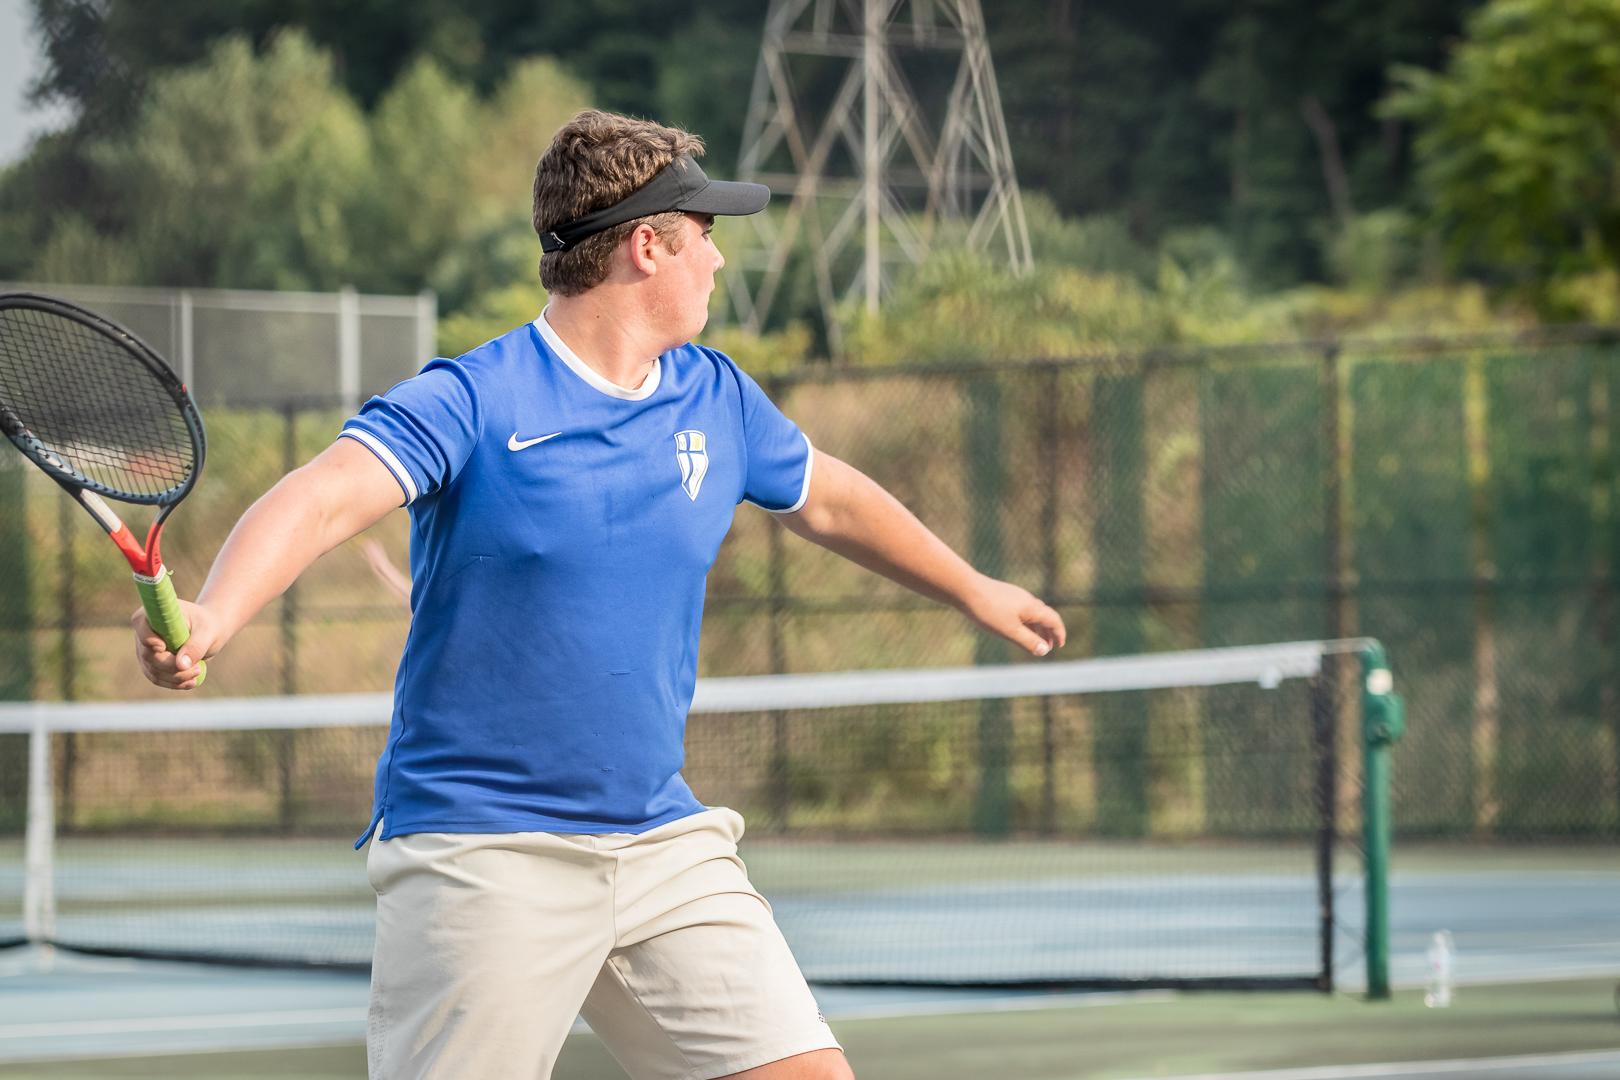 Marian-Boys-Tennis-1700.jpg